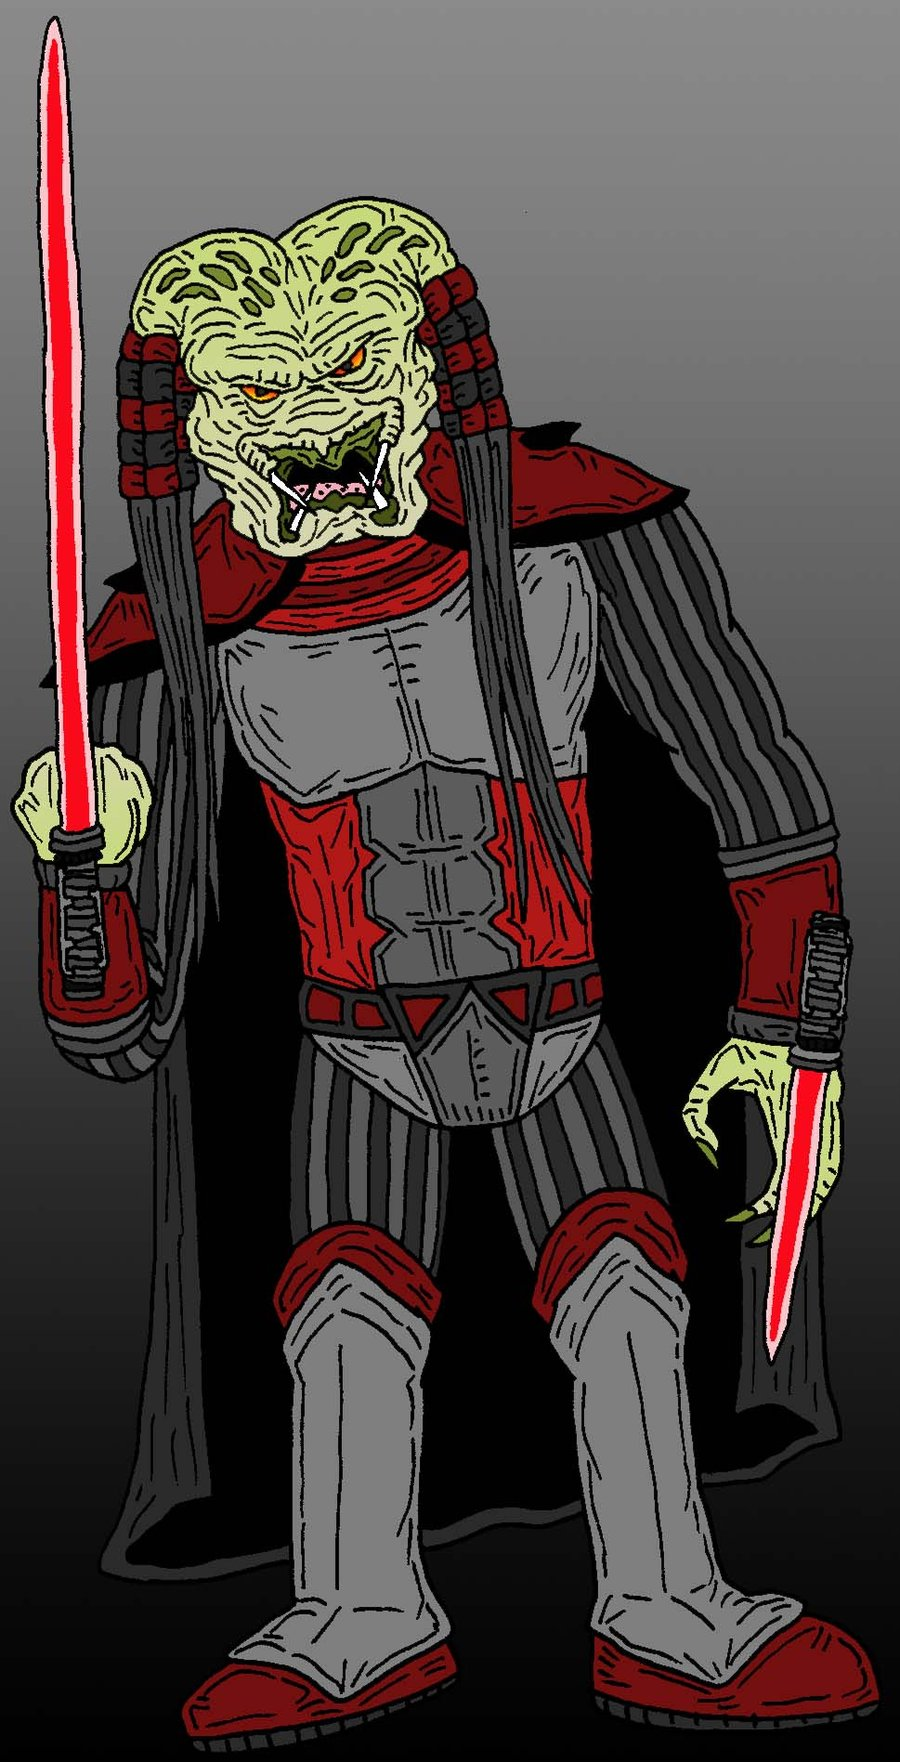 Drawn predator sith Sith by Predator Sith Sith